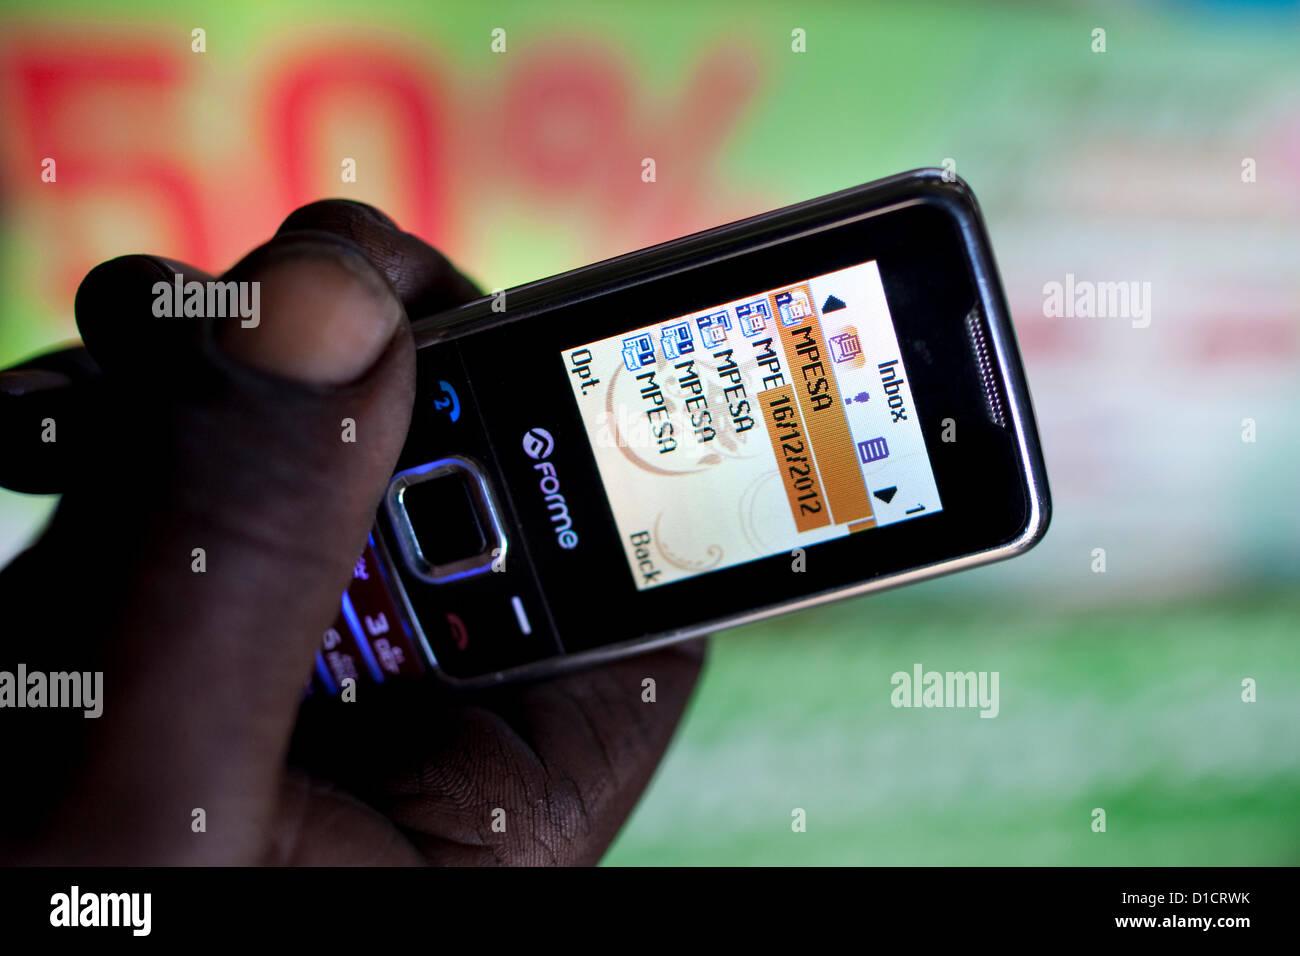 M-Pesa mobile-phone money transfer service in Kenya Stock Photo